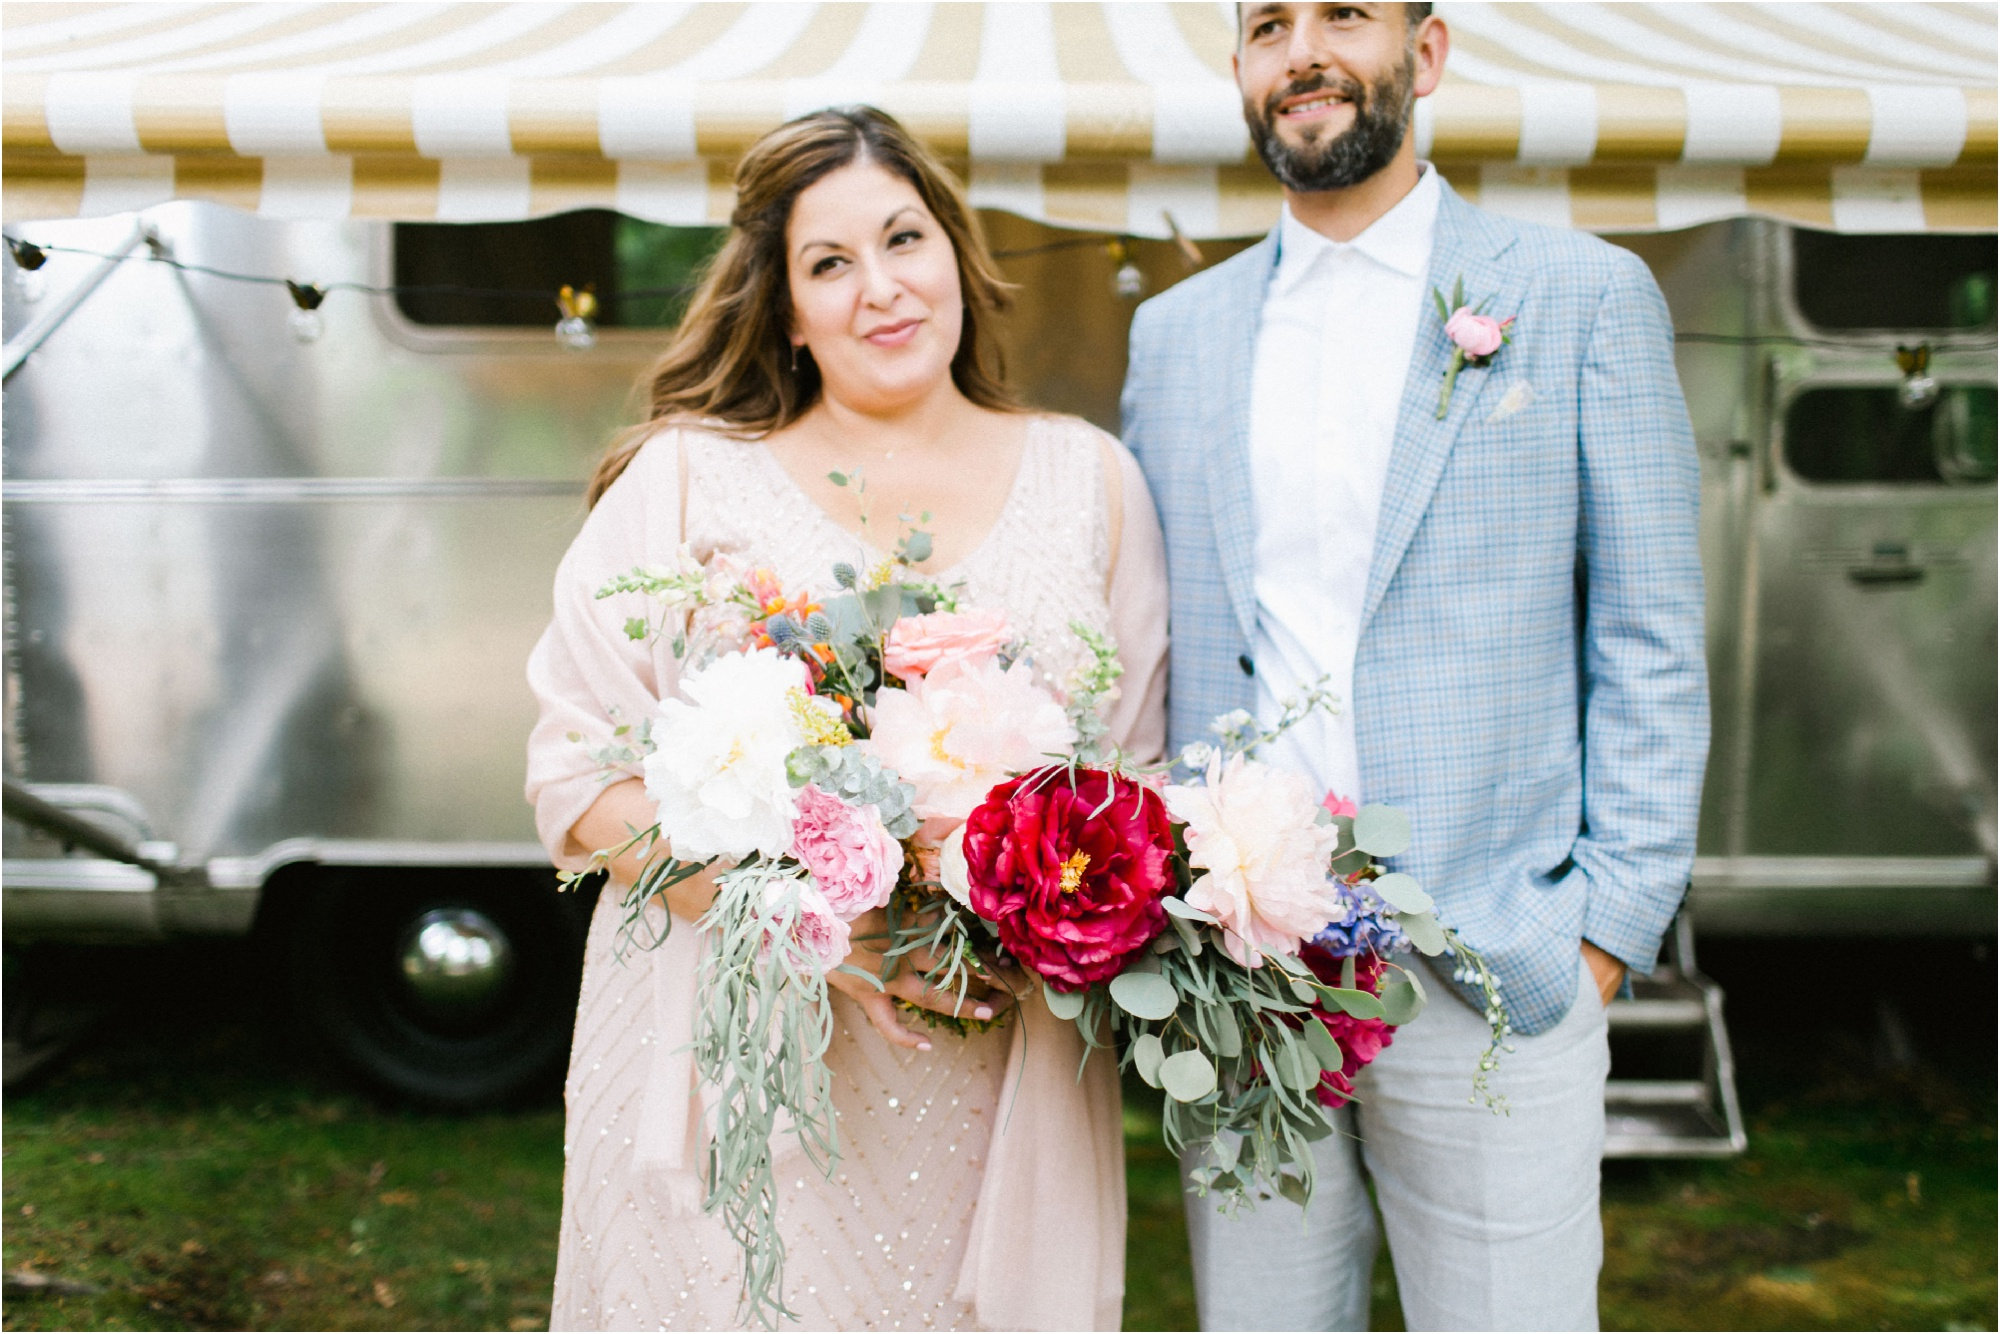 Wedding Photography Brainerd MN Aimee Jobe Photography Private Lake Residence Bloom Designs_0091.jpg